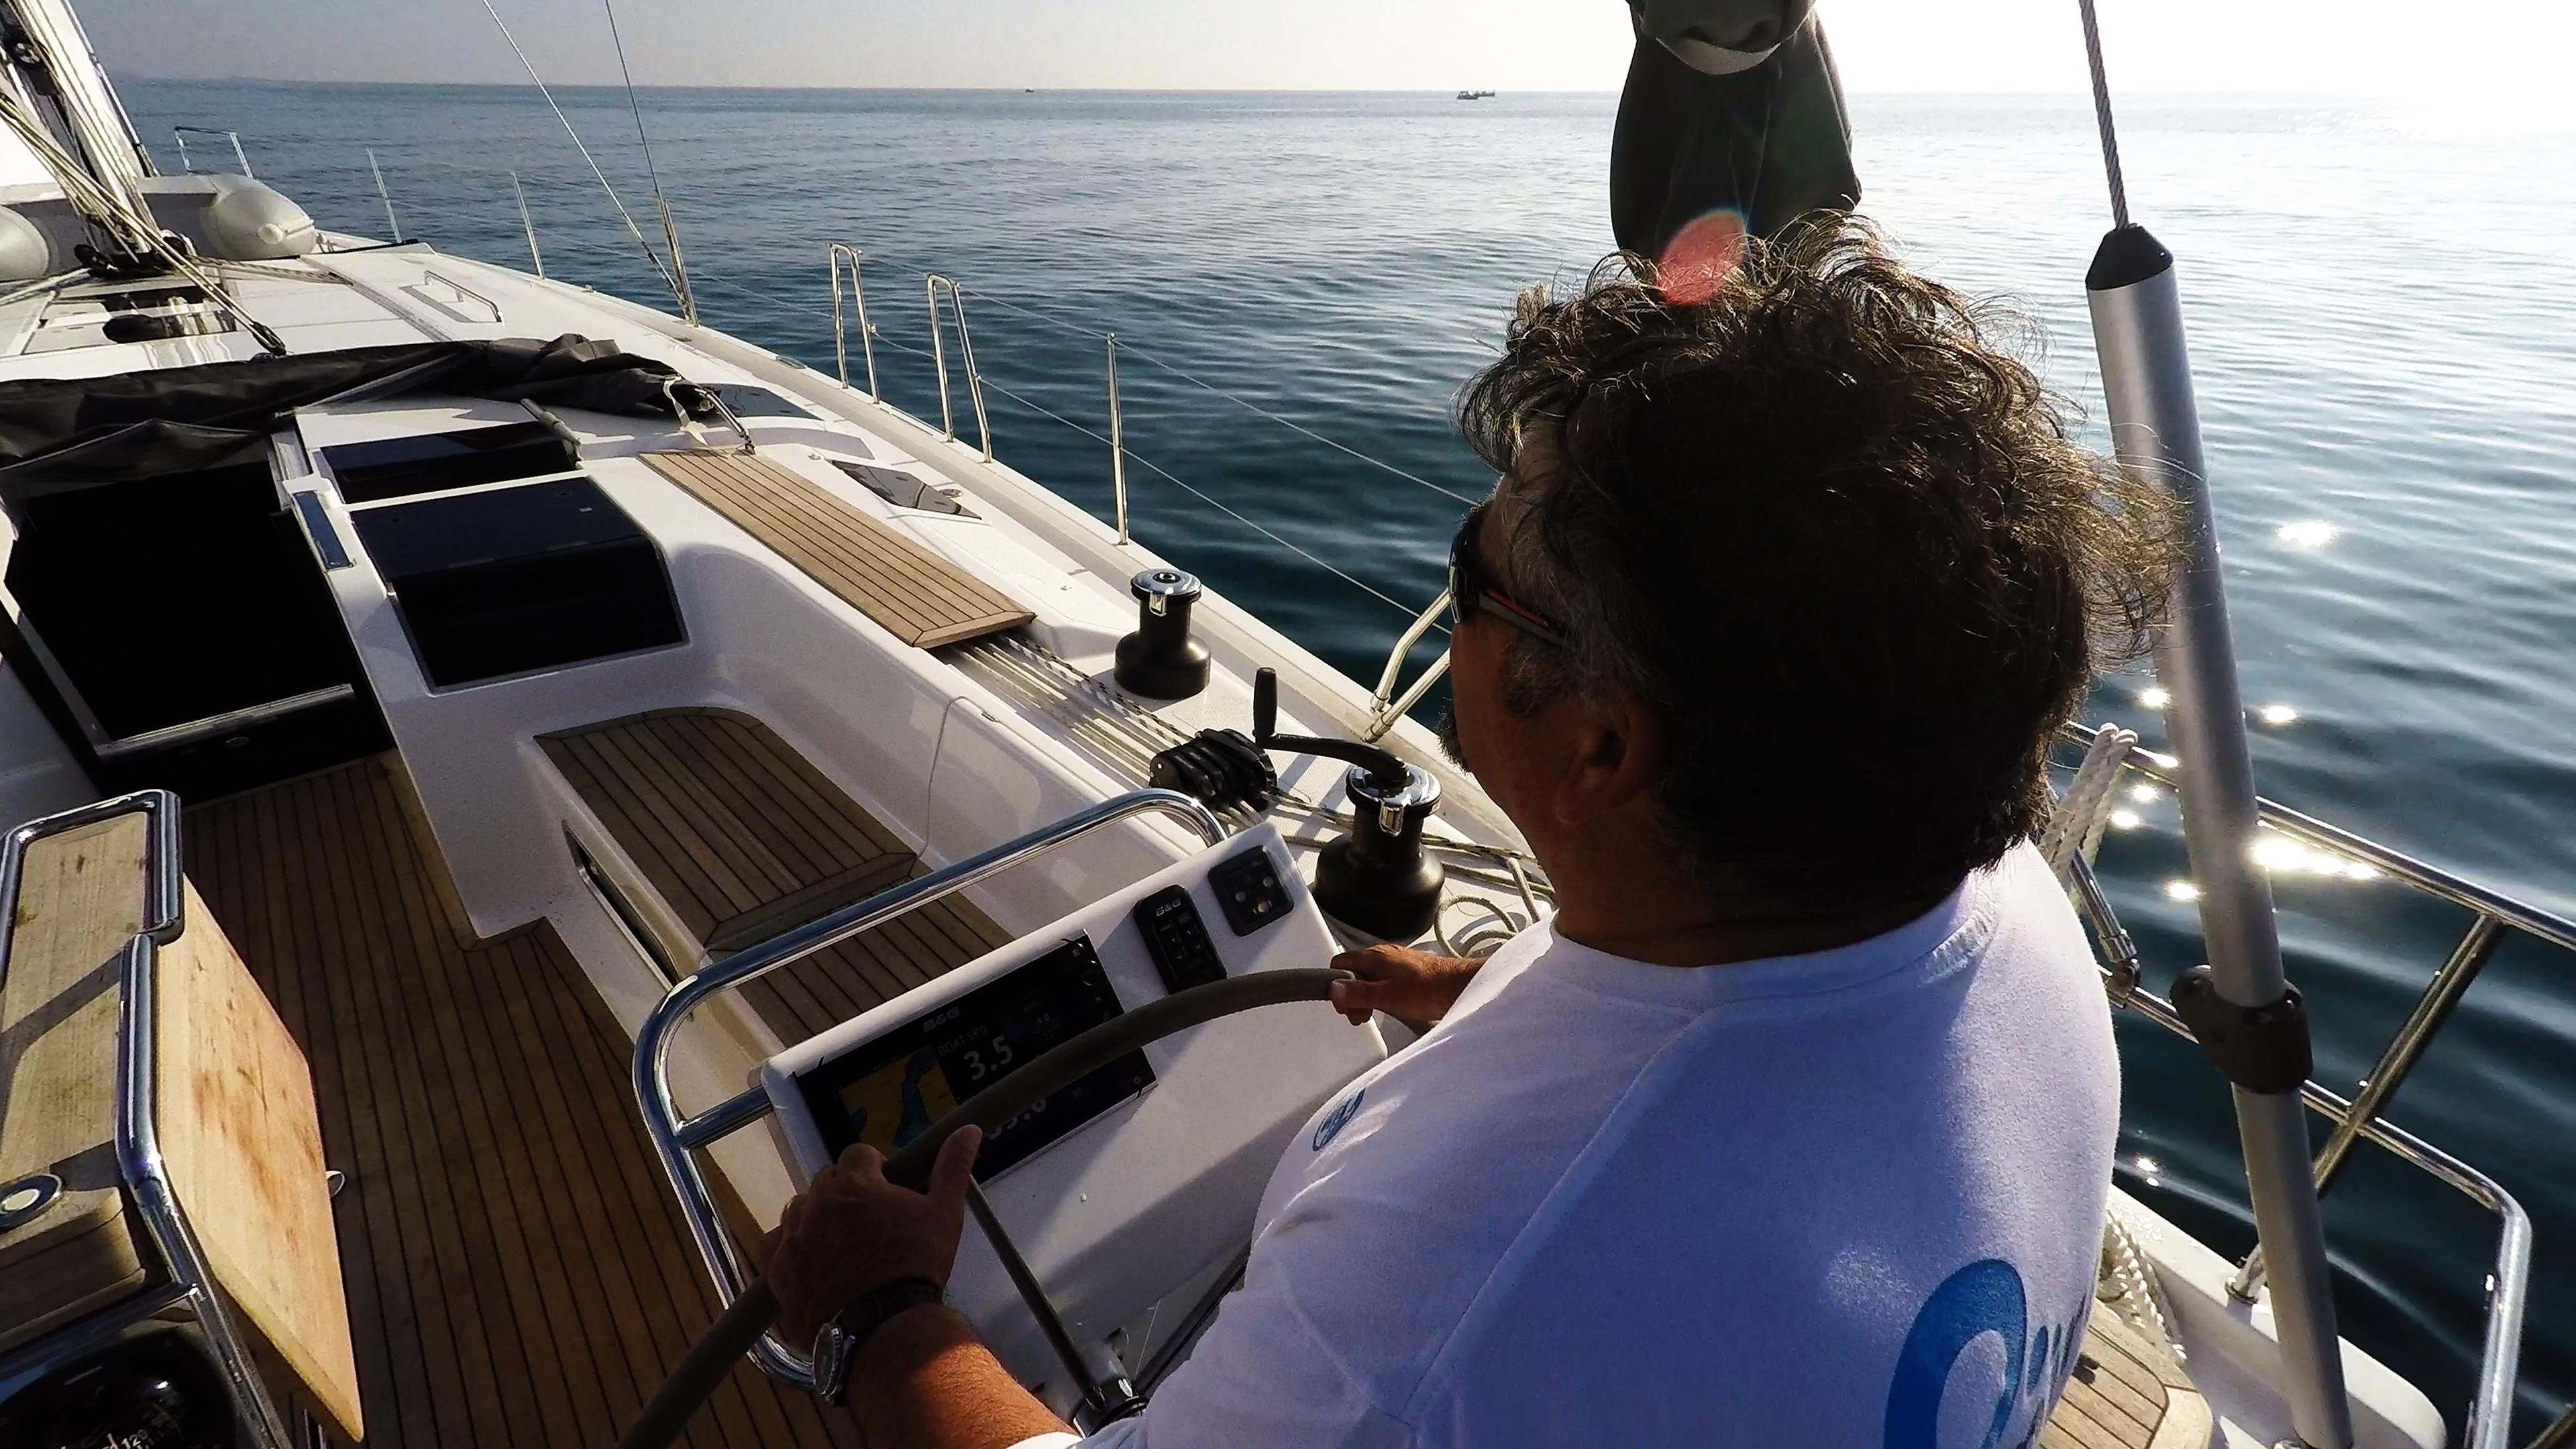 barcha a vela skipper timone ruota yacht a vela Hanse 505 pozzetto teak sole mare blu